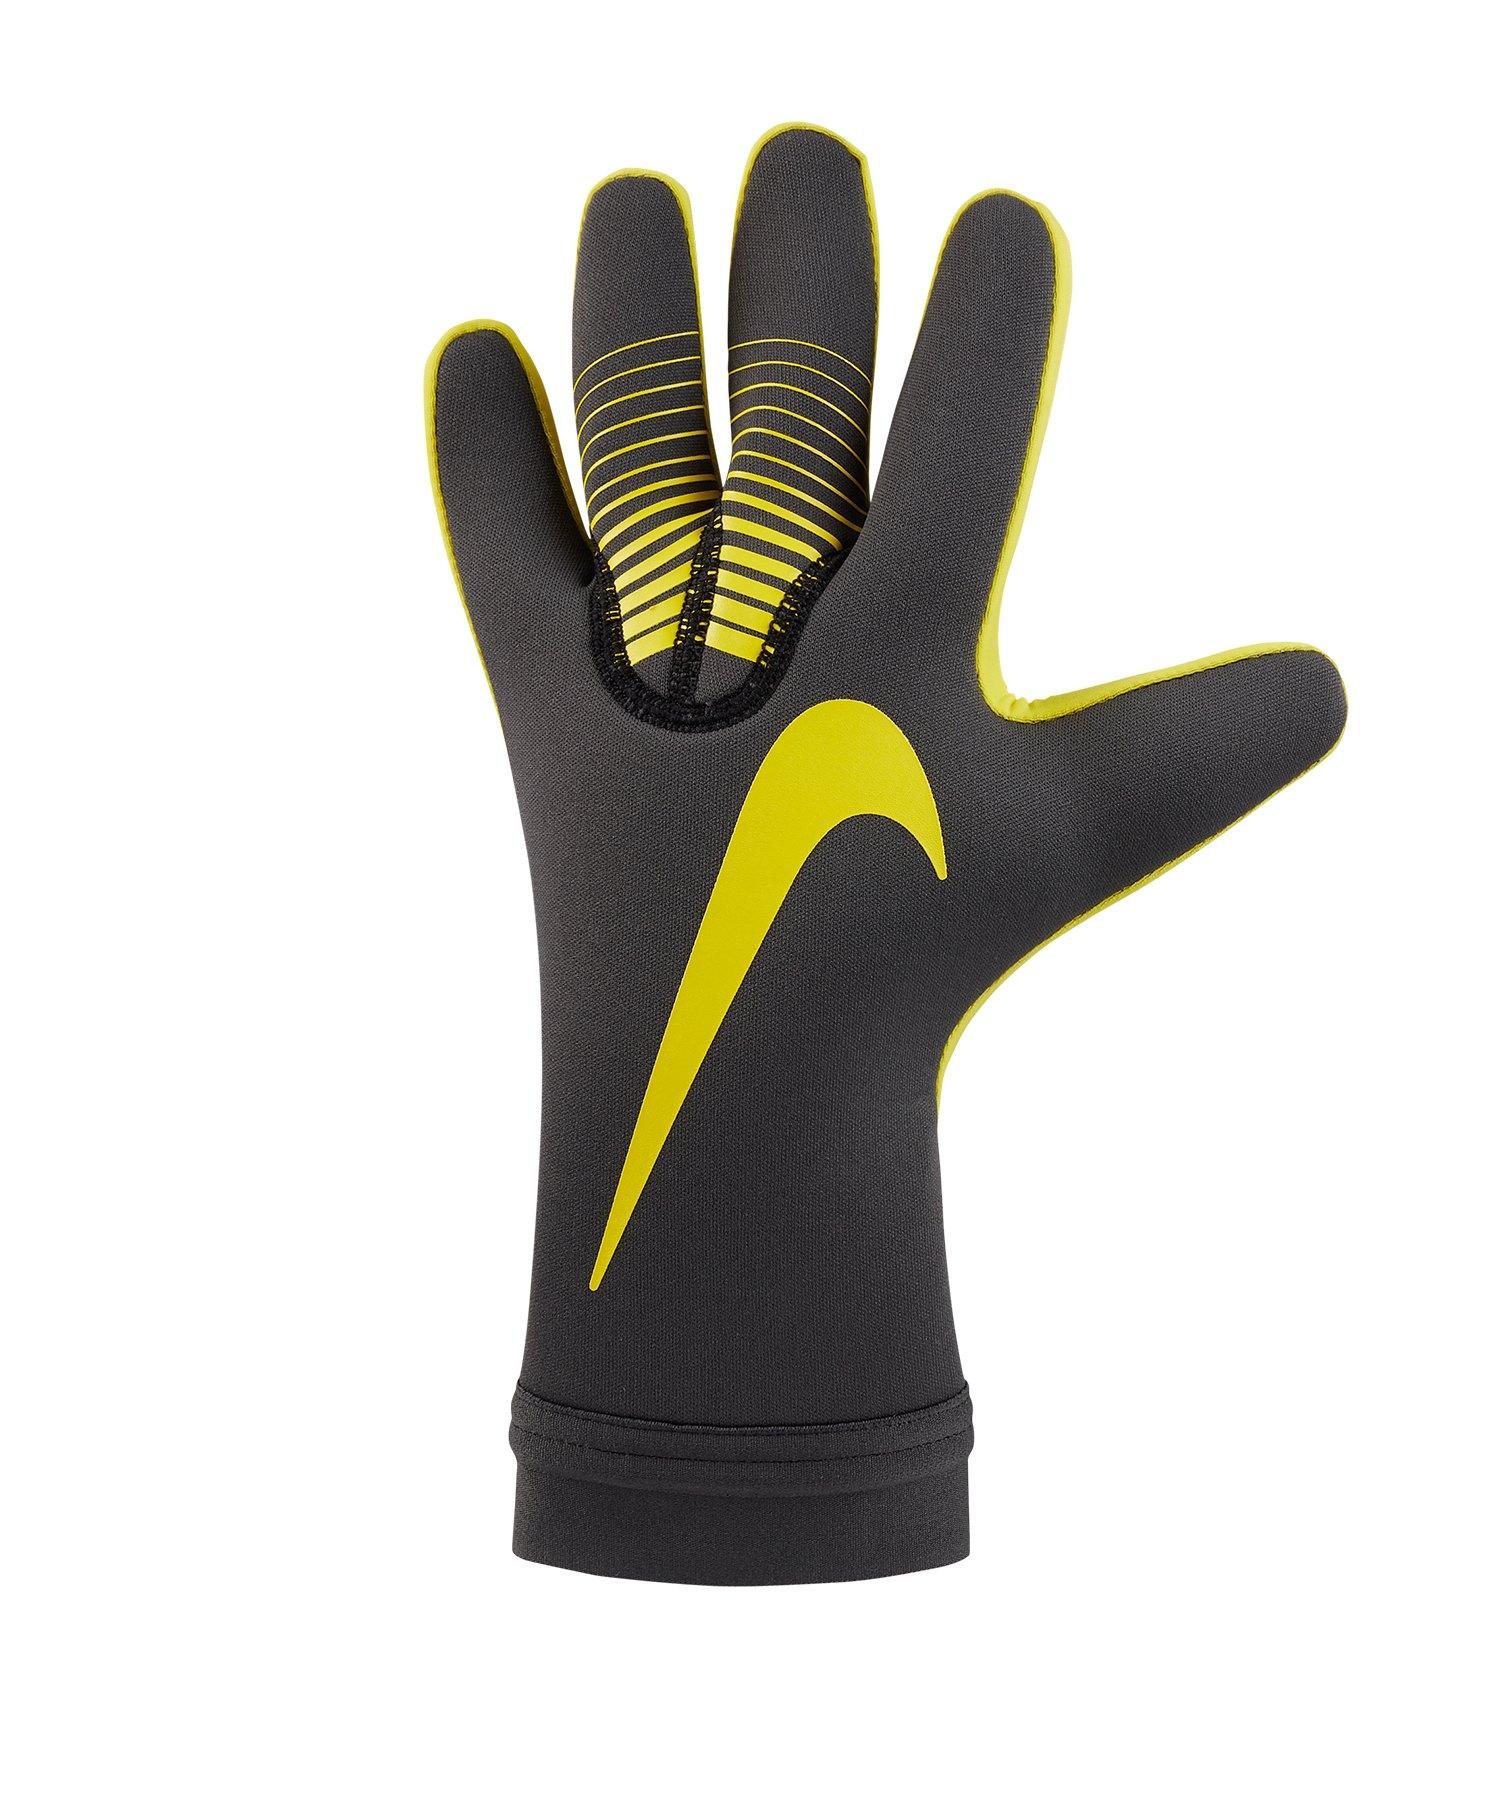 Nike Mercurial Touch Pro Torwarthandschuh F060 - grau